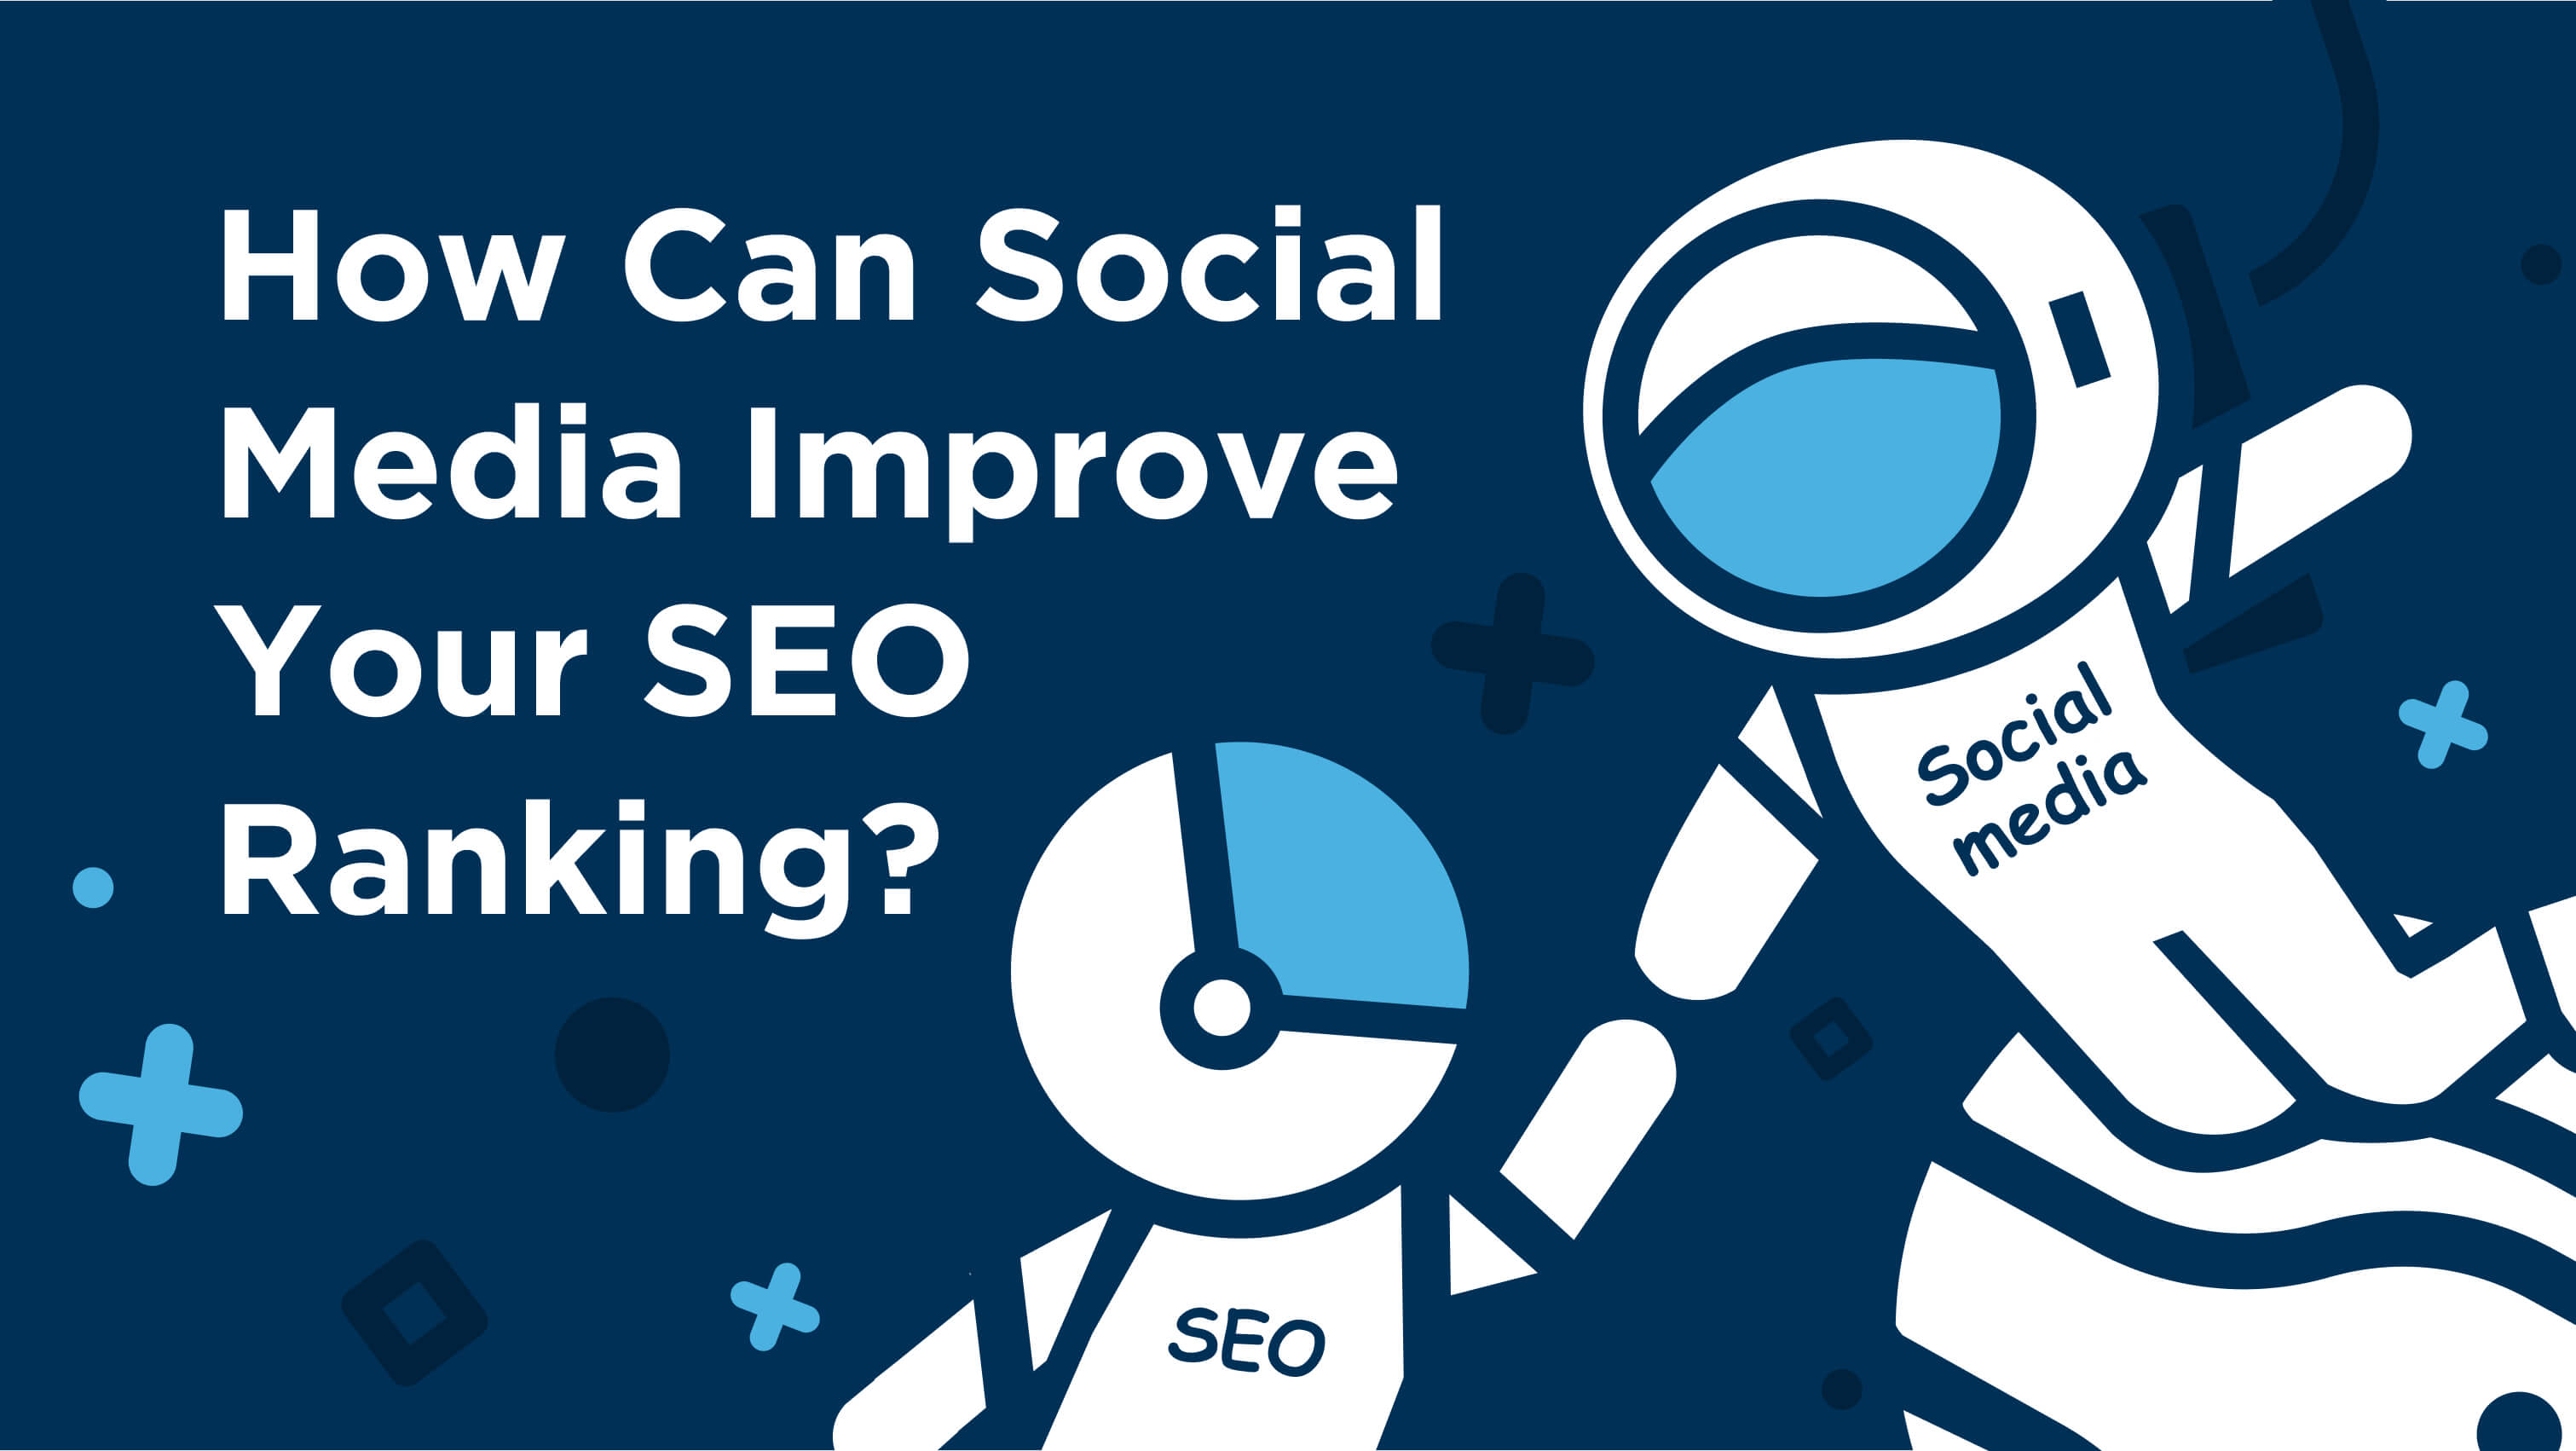 How social media marketing helps organic rankings?